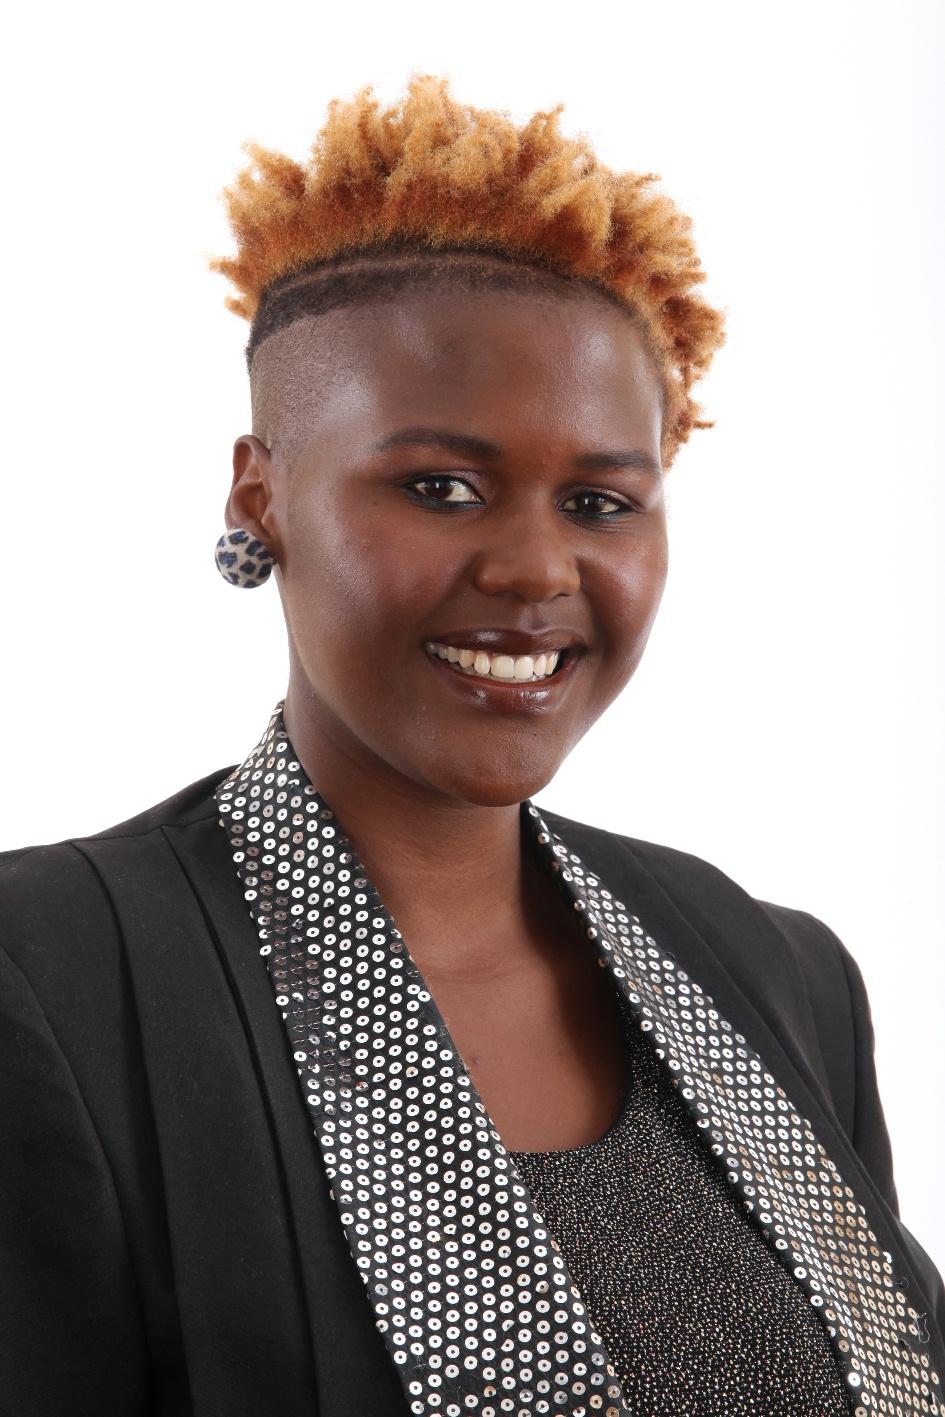 Butterphly Mharapara